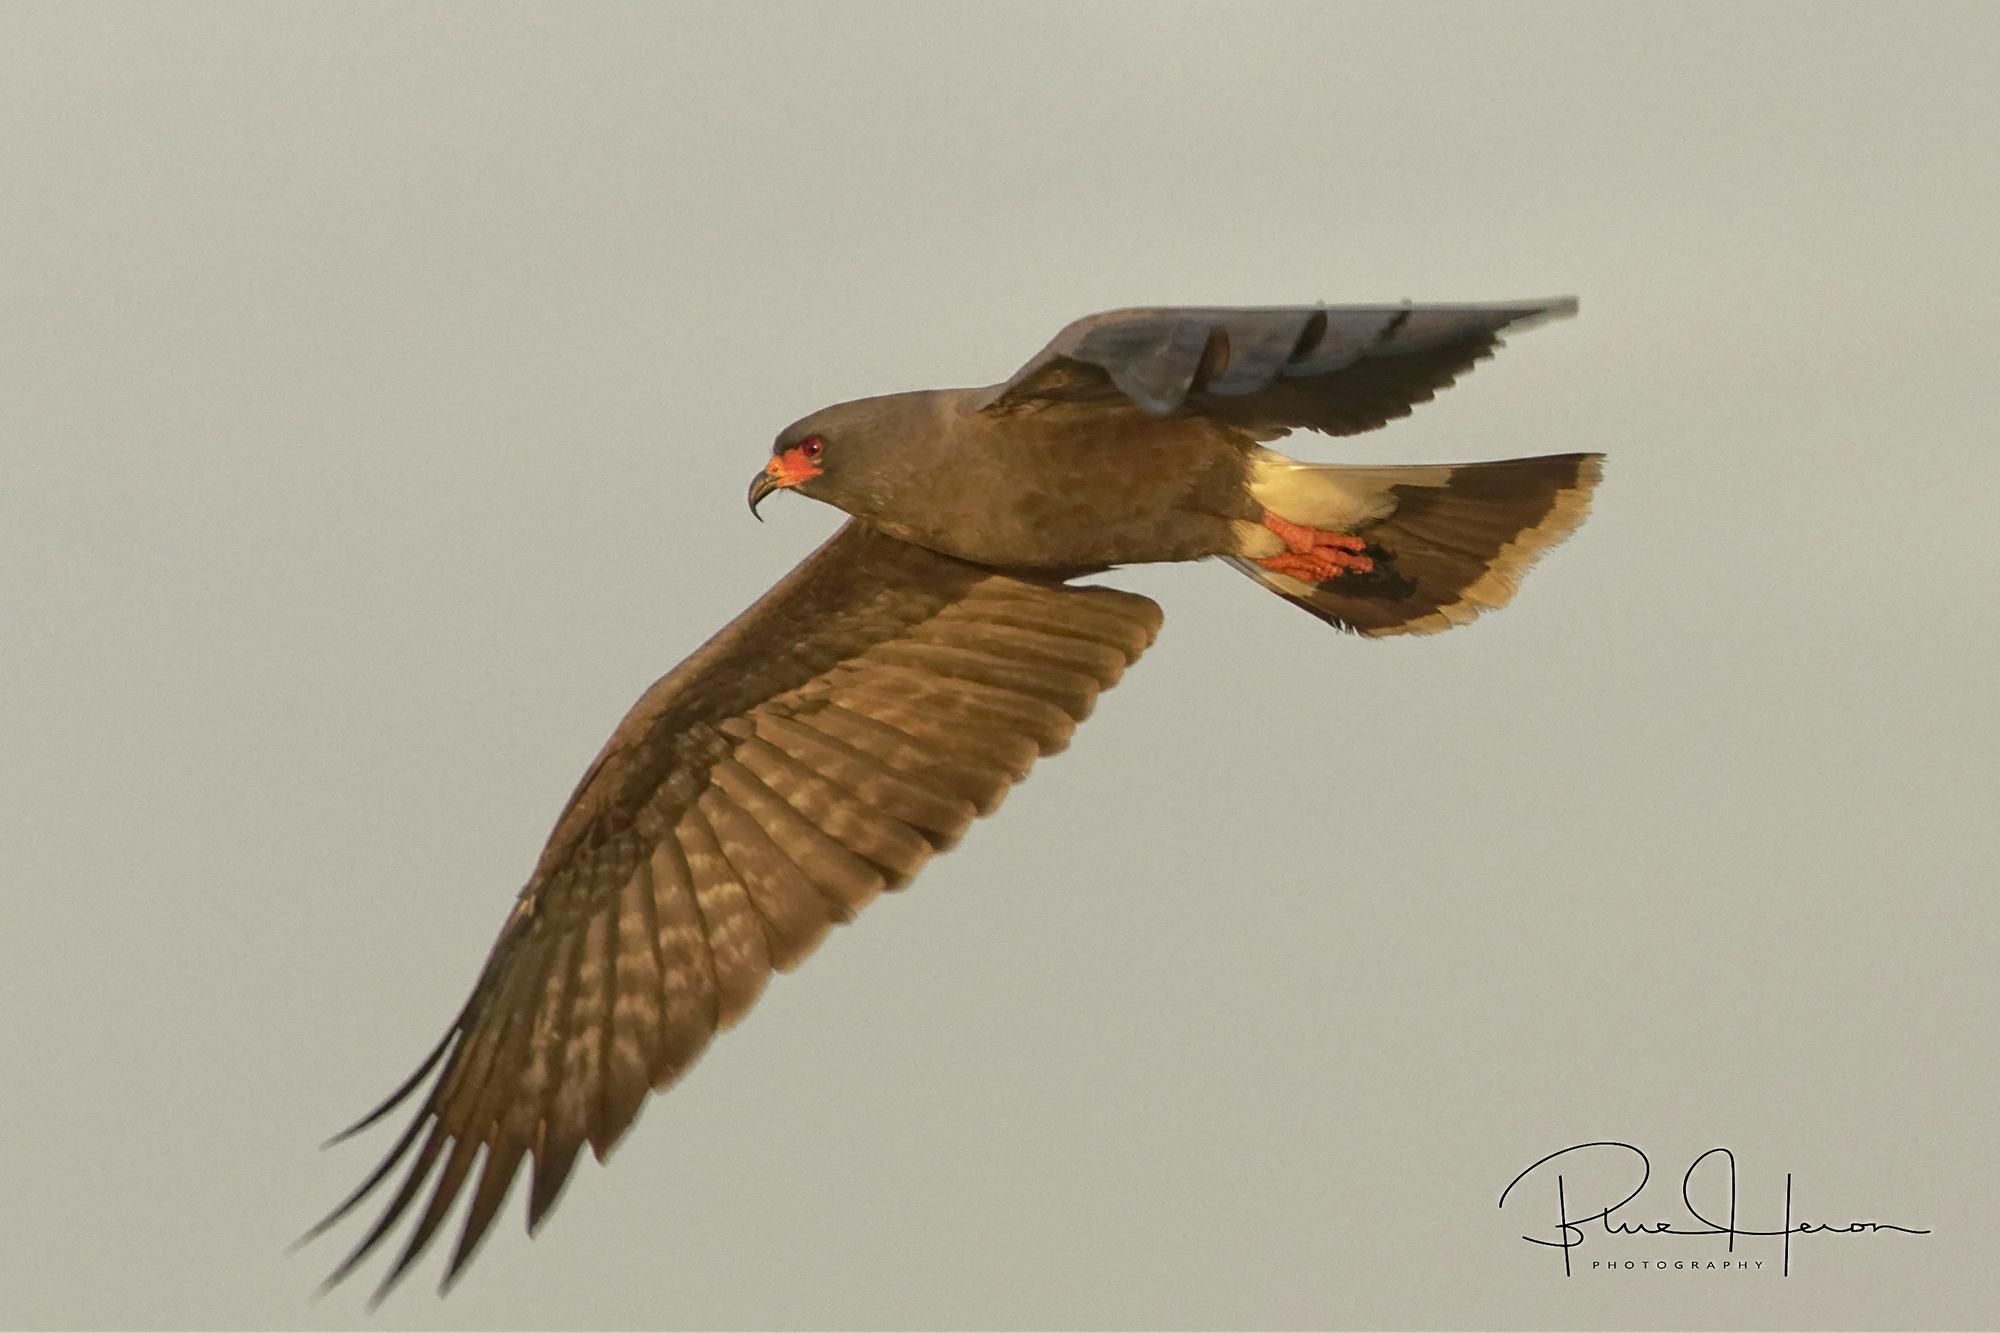 Maie Snail Kite in flight in early morning light